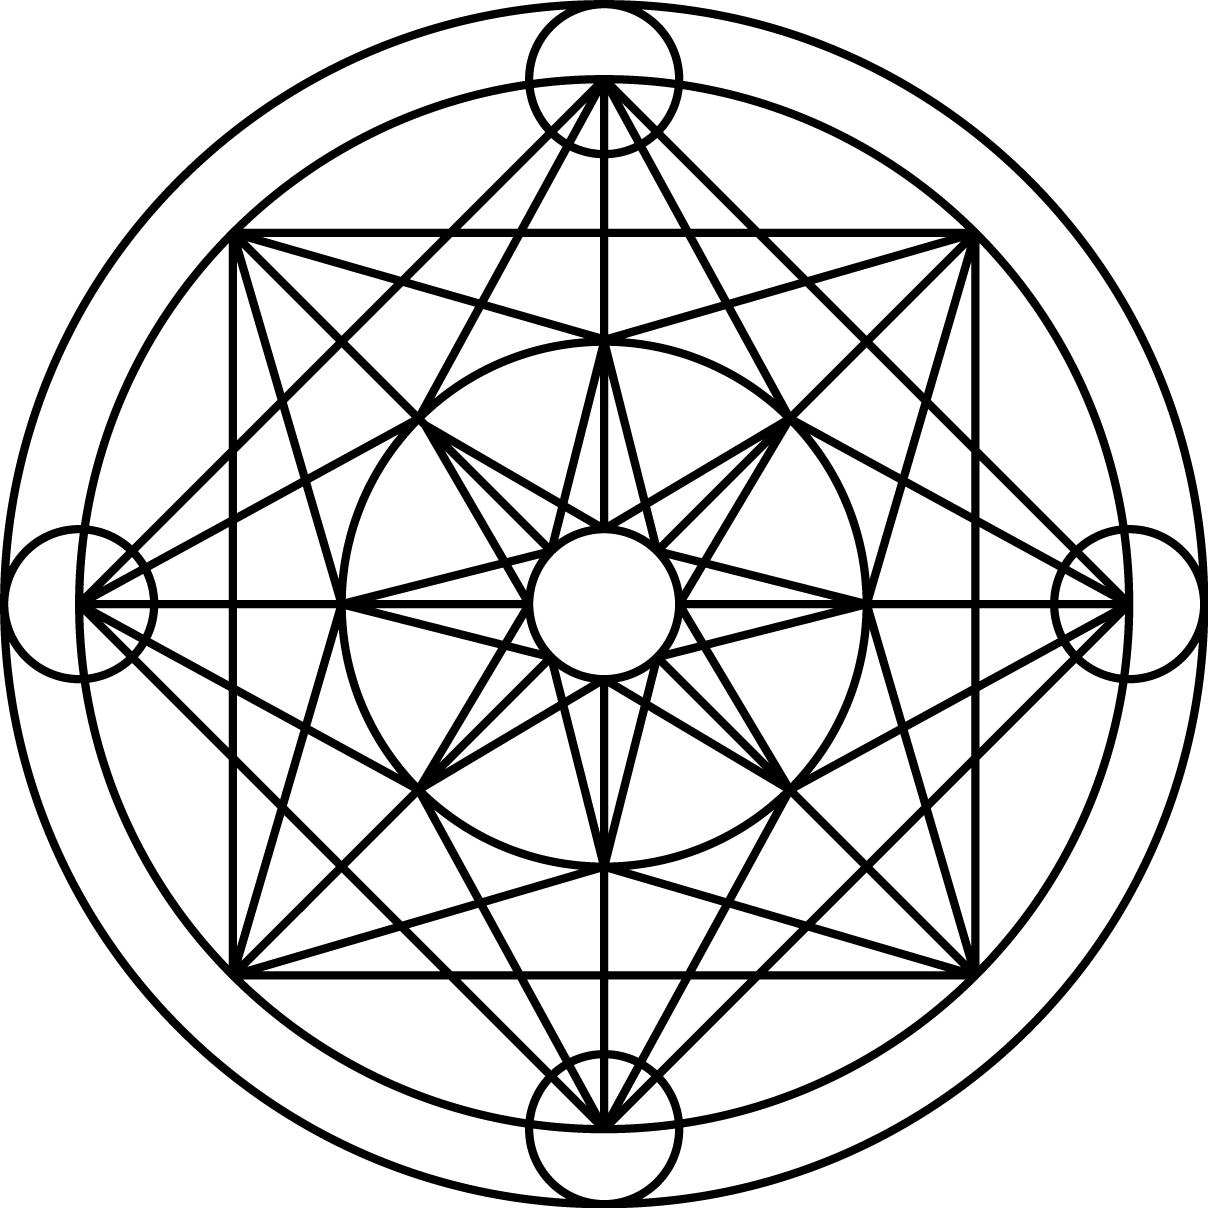 Magic Circles and Orgone « The Digital Ambler